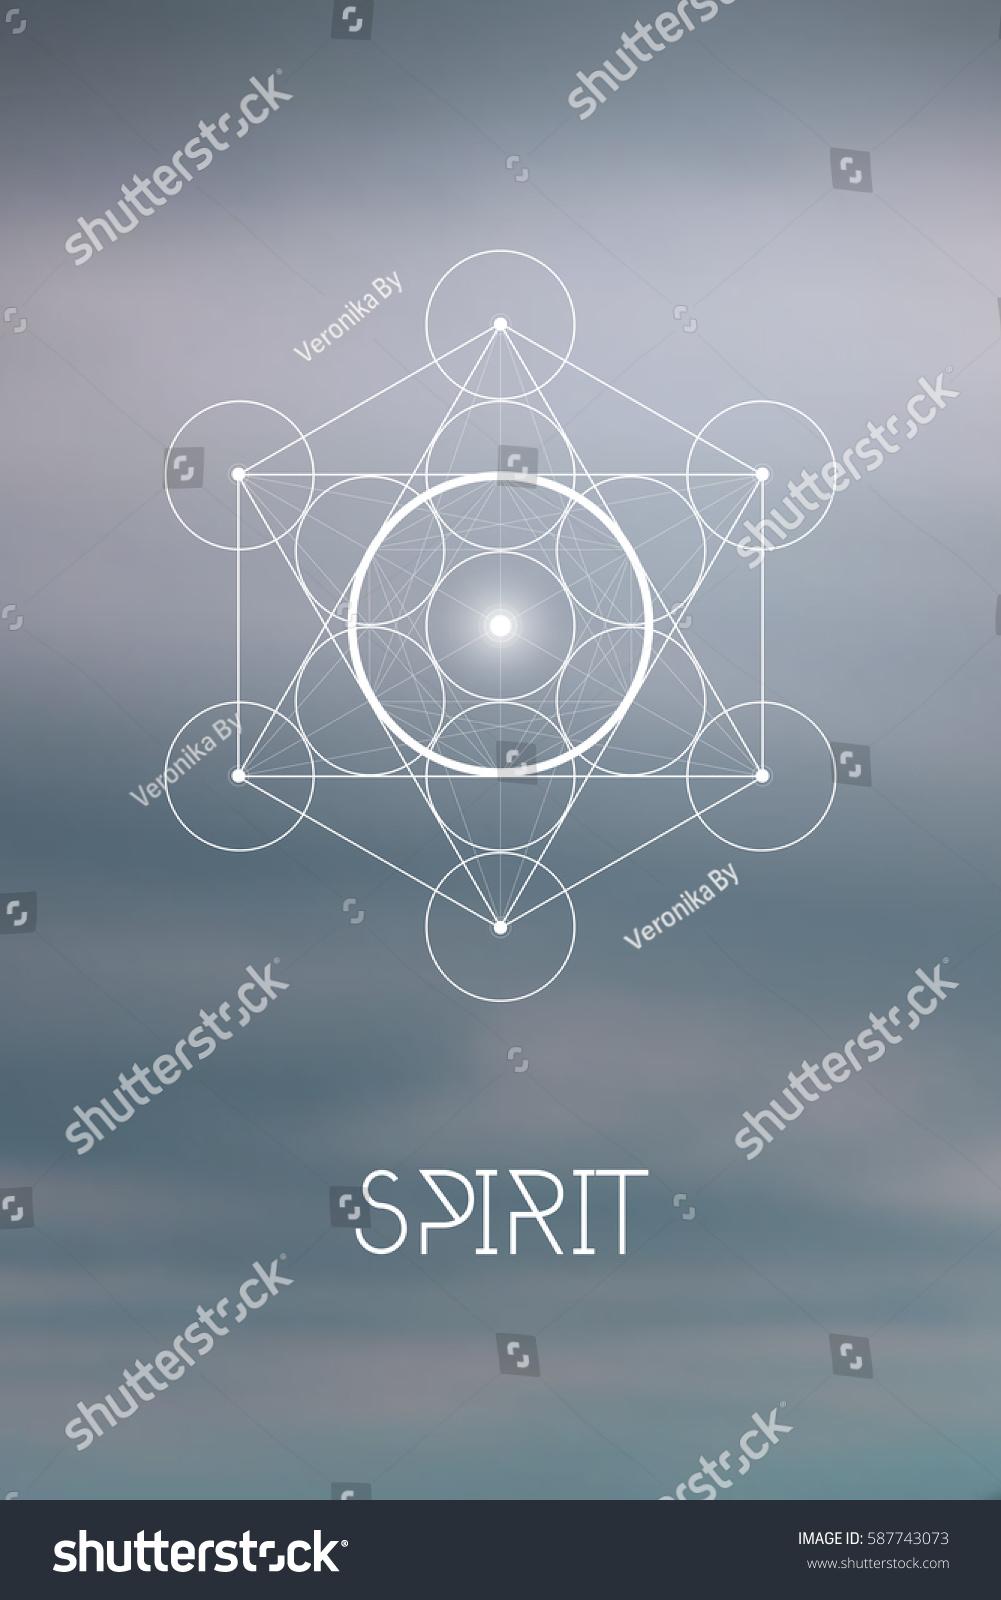 Spirit Element Inside Metatron Cube Flower Stock Vector (Royalty